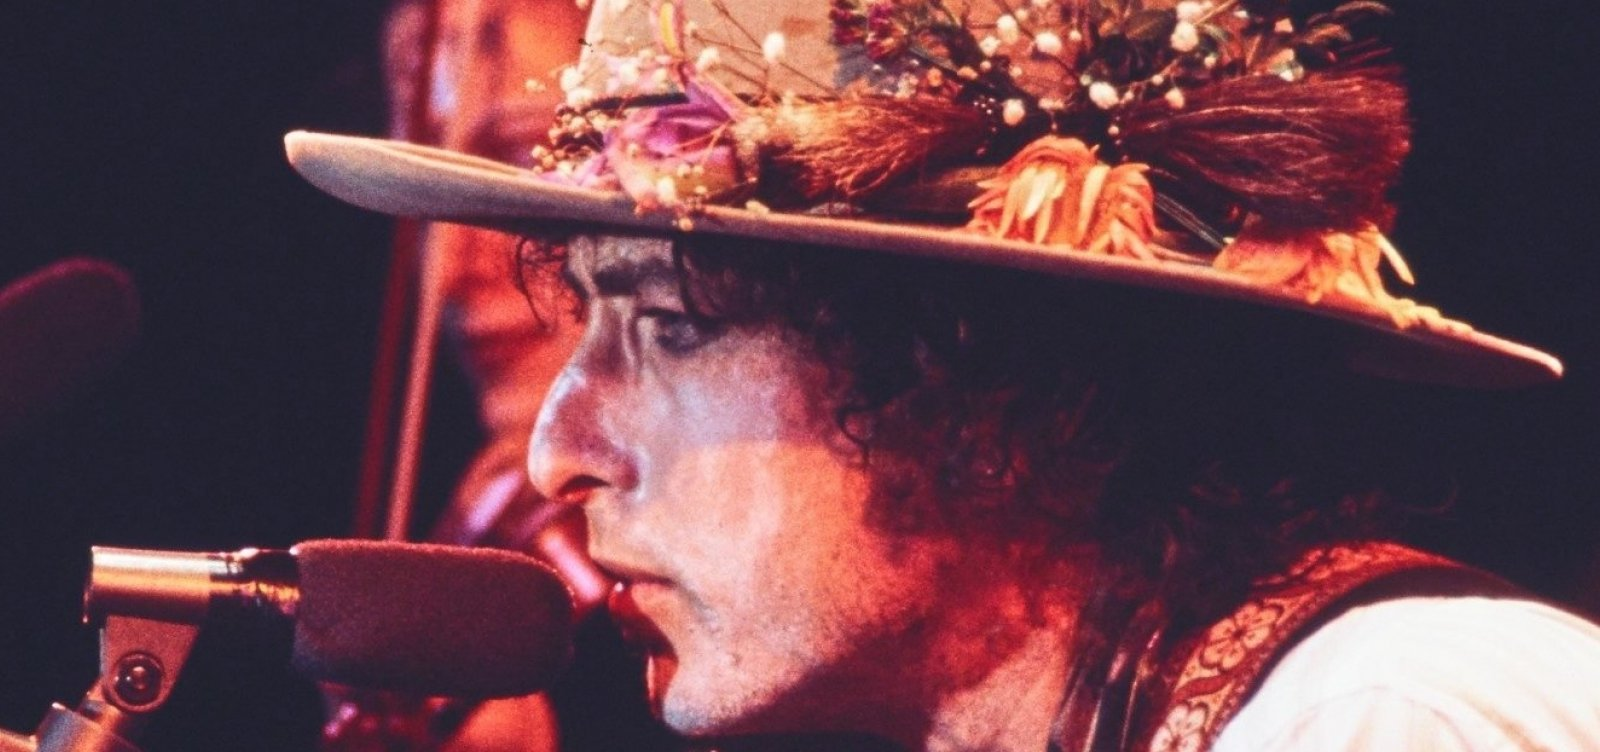 [Novo documentário de Martin Scorsese sobre Bob Dylan ganha trailer]